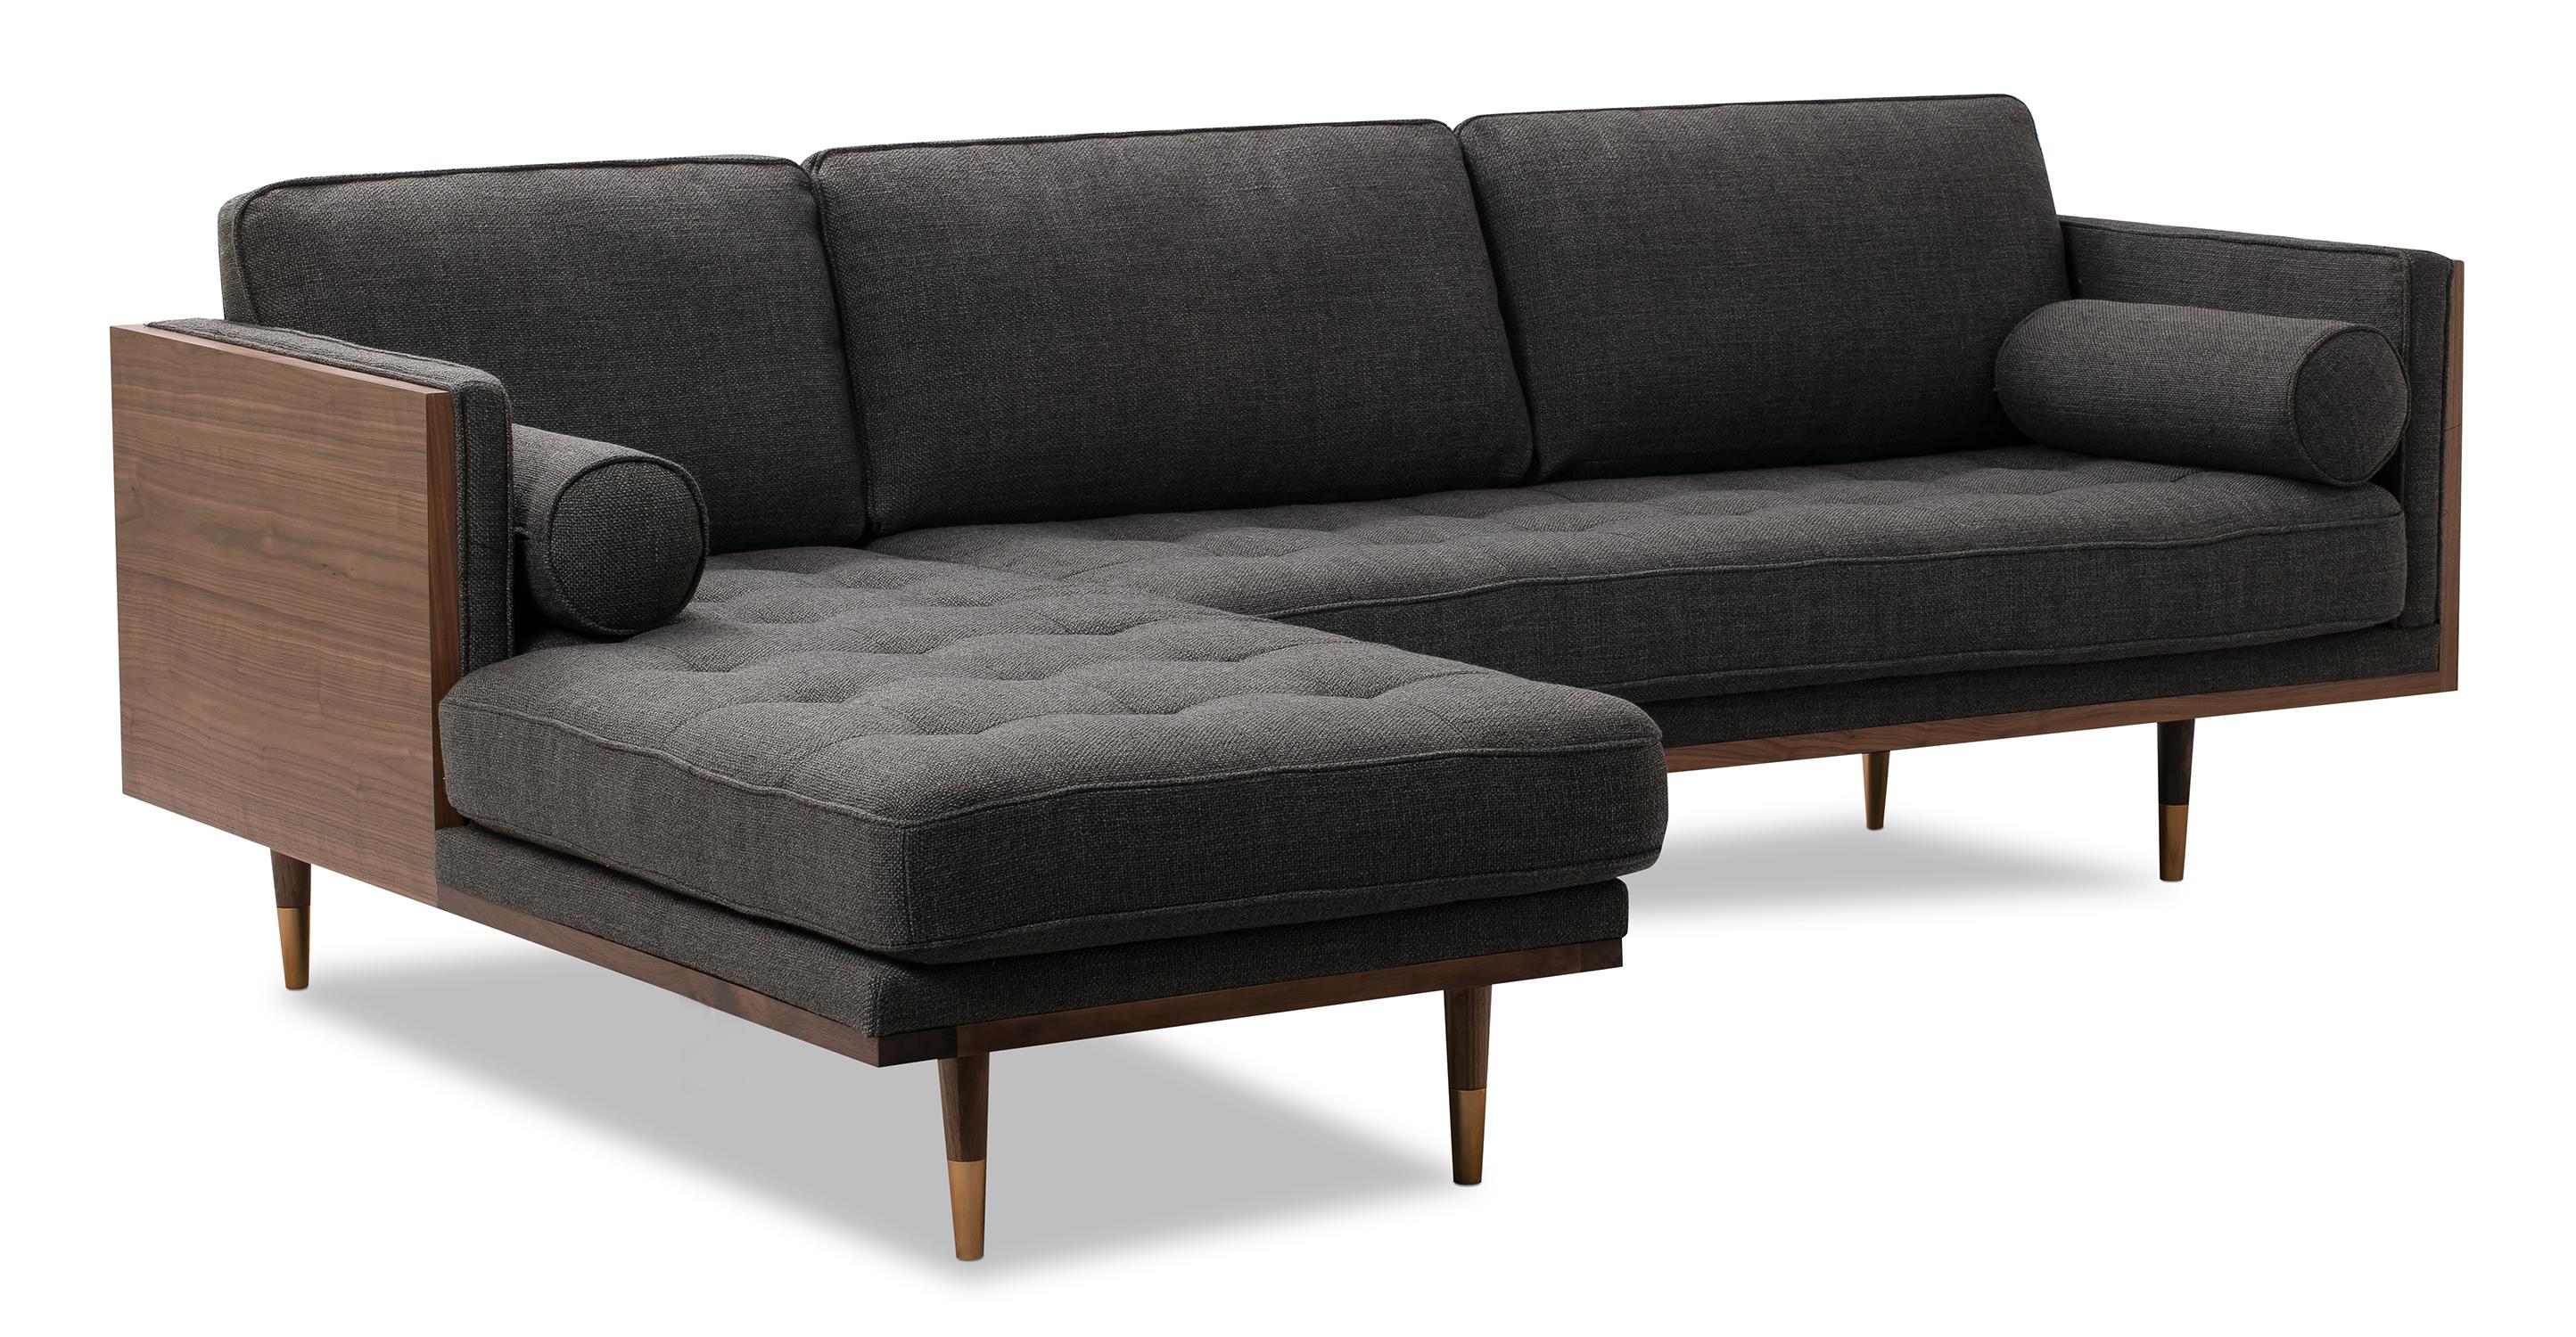 "Woodrow Skandi 95"" Fabric Sectional Left, Walnut/Dior Grey"